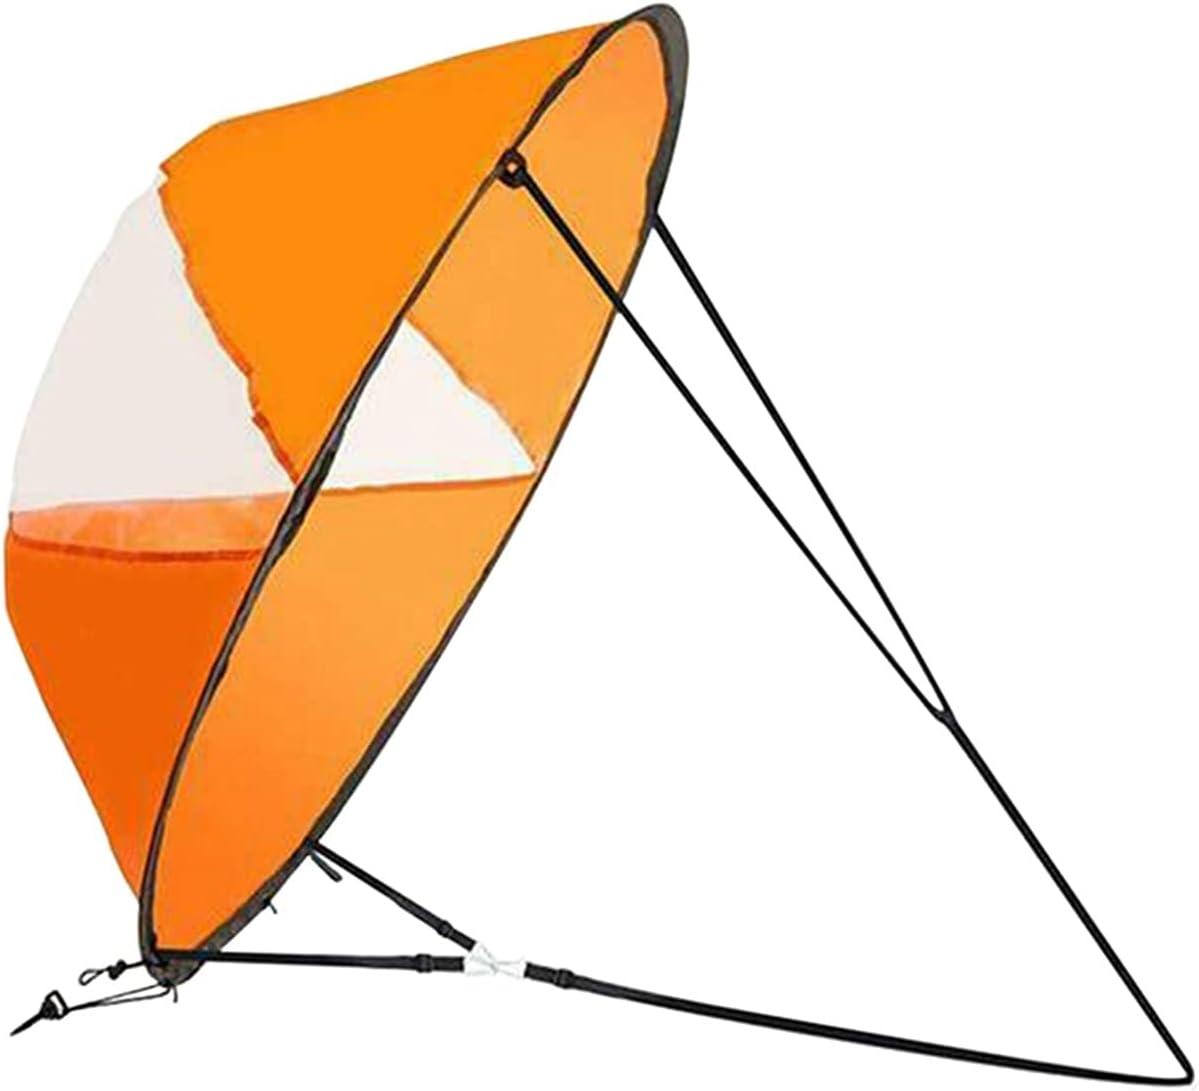 Downwind Sail Waterproof Fashion Ultralight Foldable Sales results No. 1 Spor Water